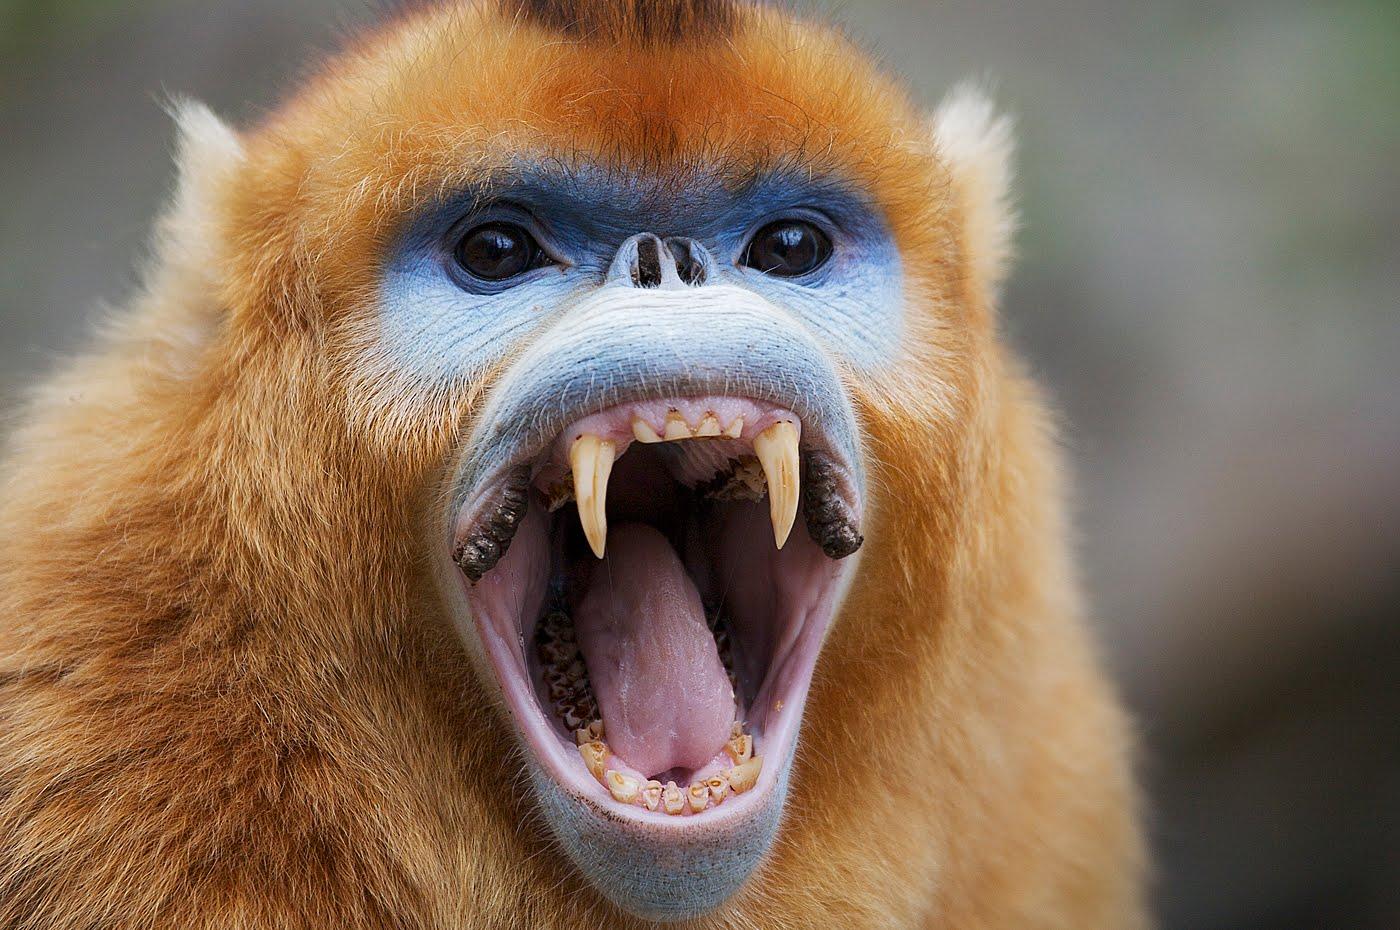 Golden Snub-nosed Monkey Backgrounds, Compatible - PC, Mobile, Gadgets| 1400x930 px